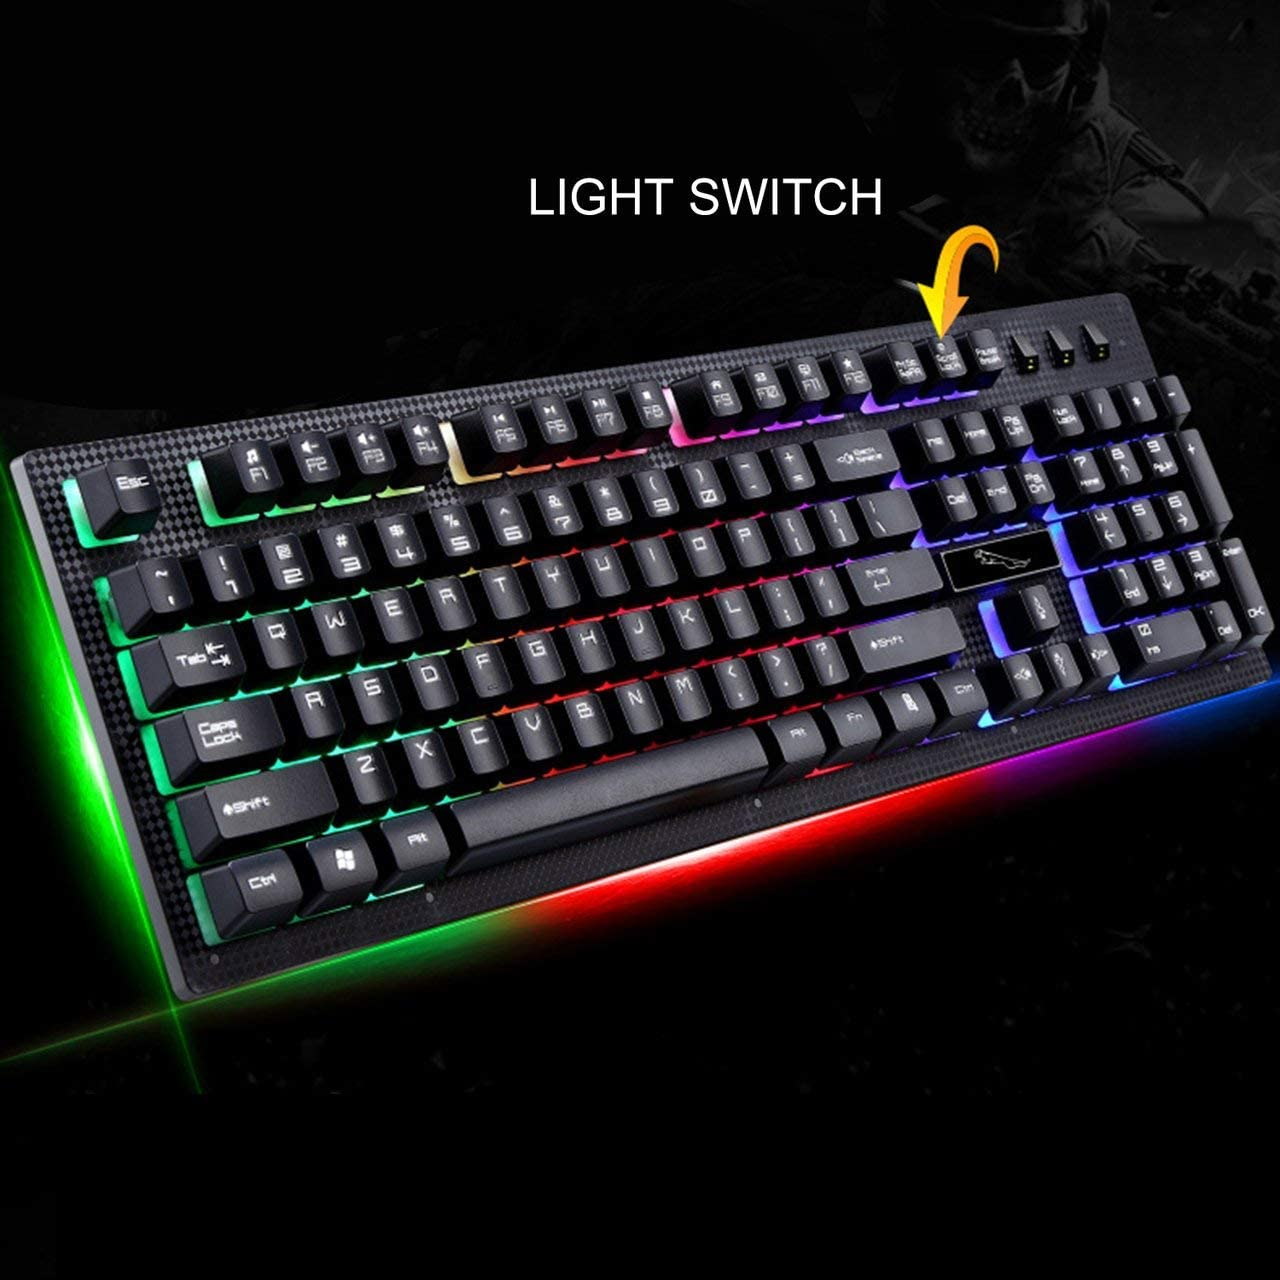 G20 Wired USB Illuminated Multi Color Backlight Gaming Keyboard Ergonomic Comfortable 114 Keys Keyboard for PC Laptop